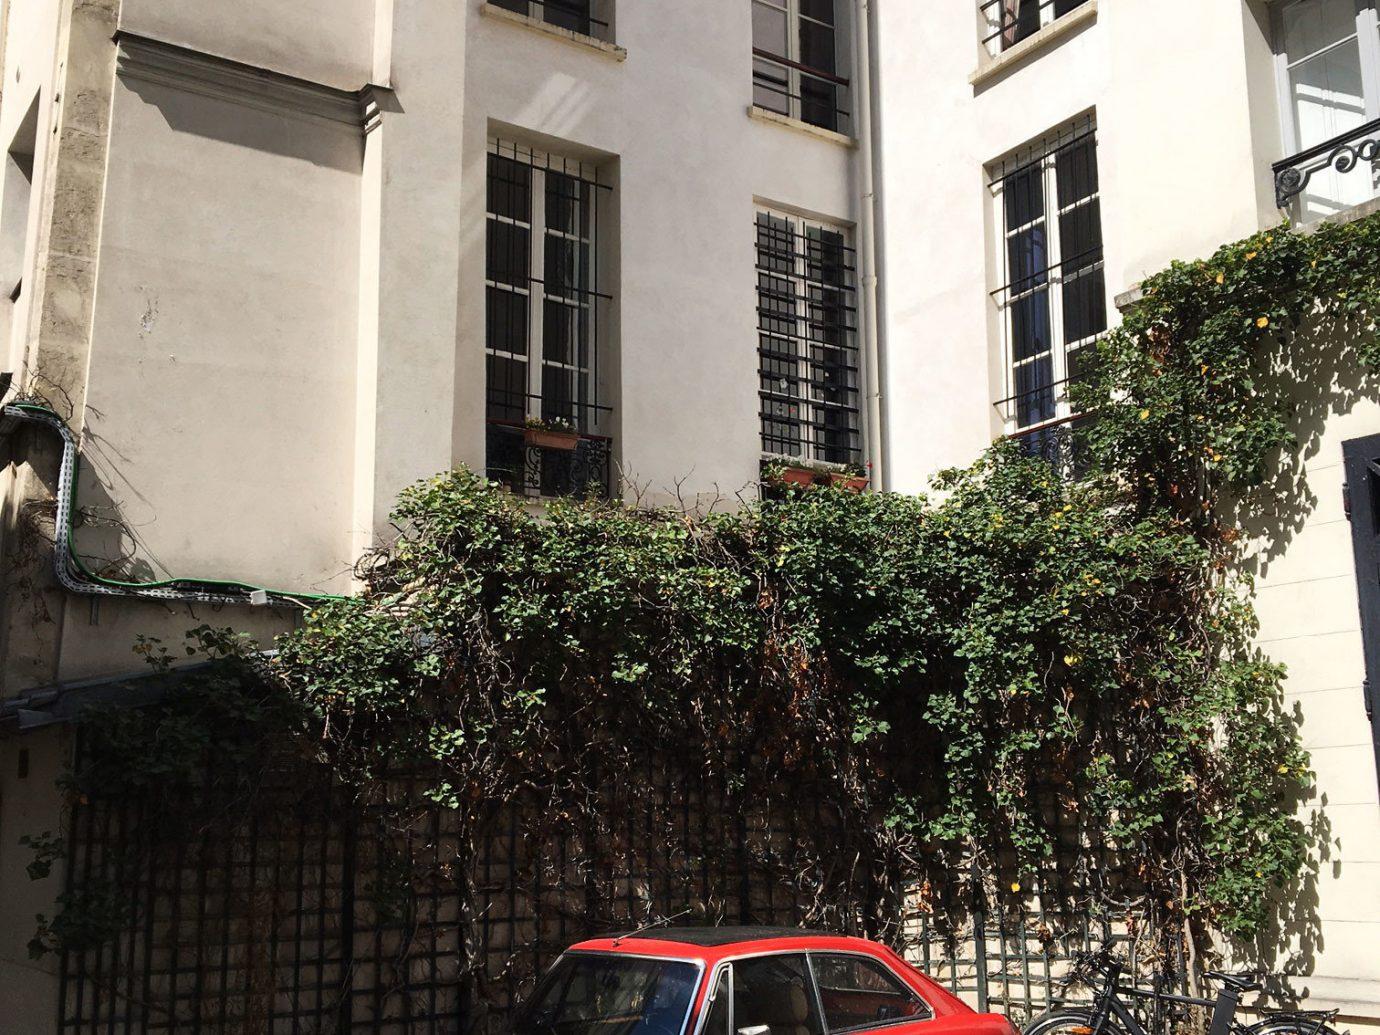 Exterior view of Galerie Perrotin